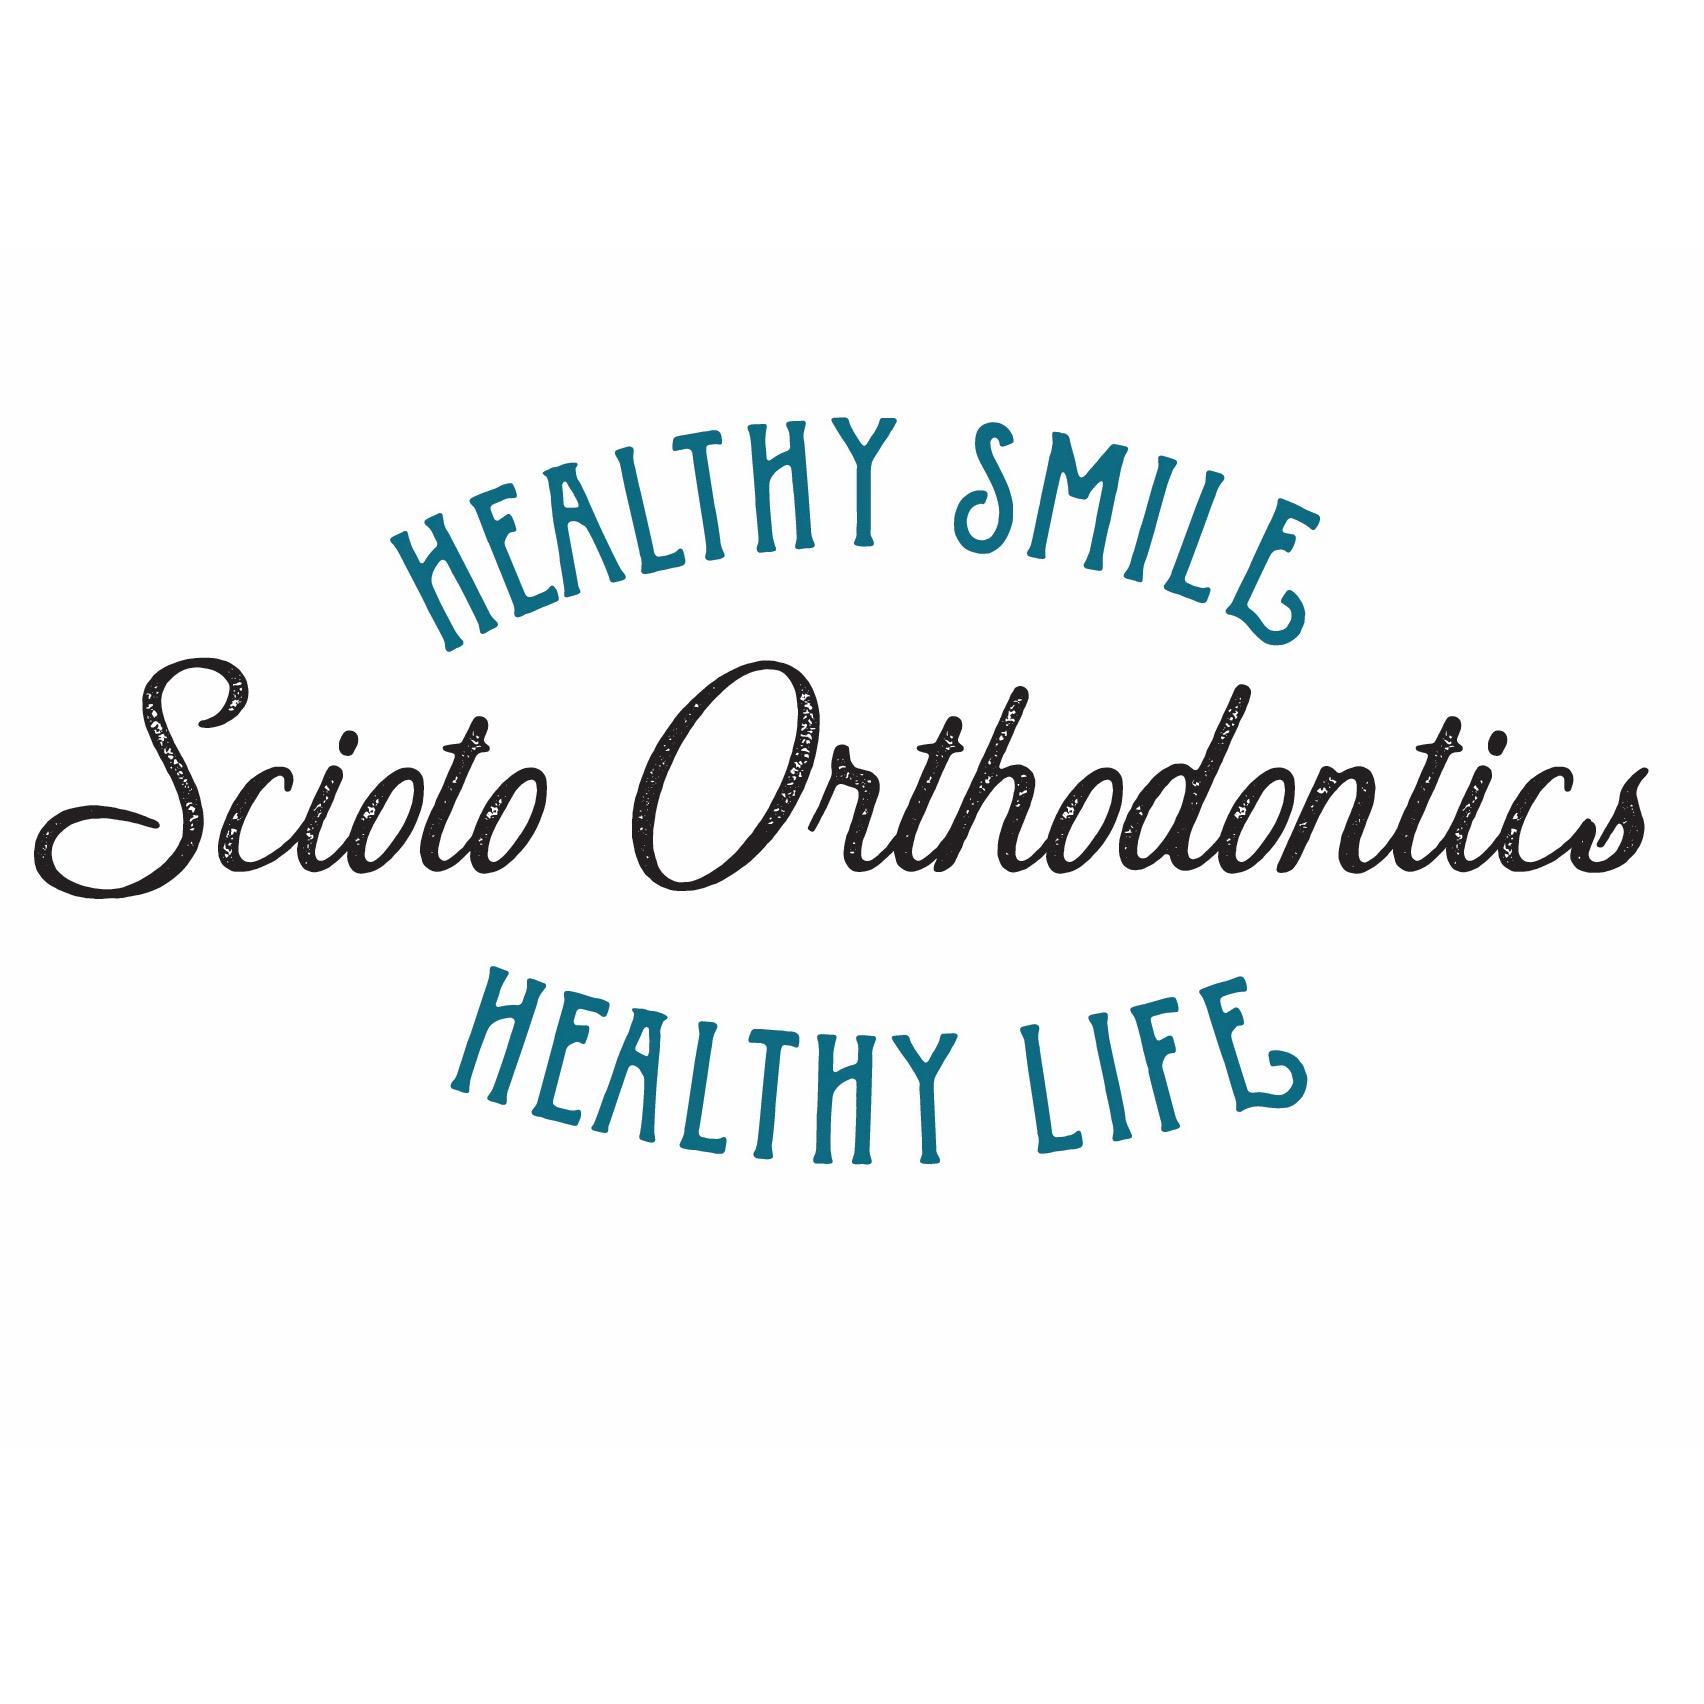 Scioto Orthodontics